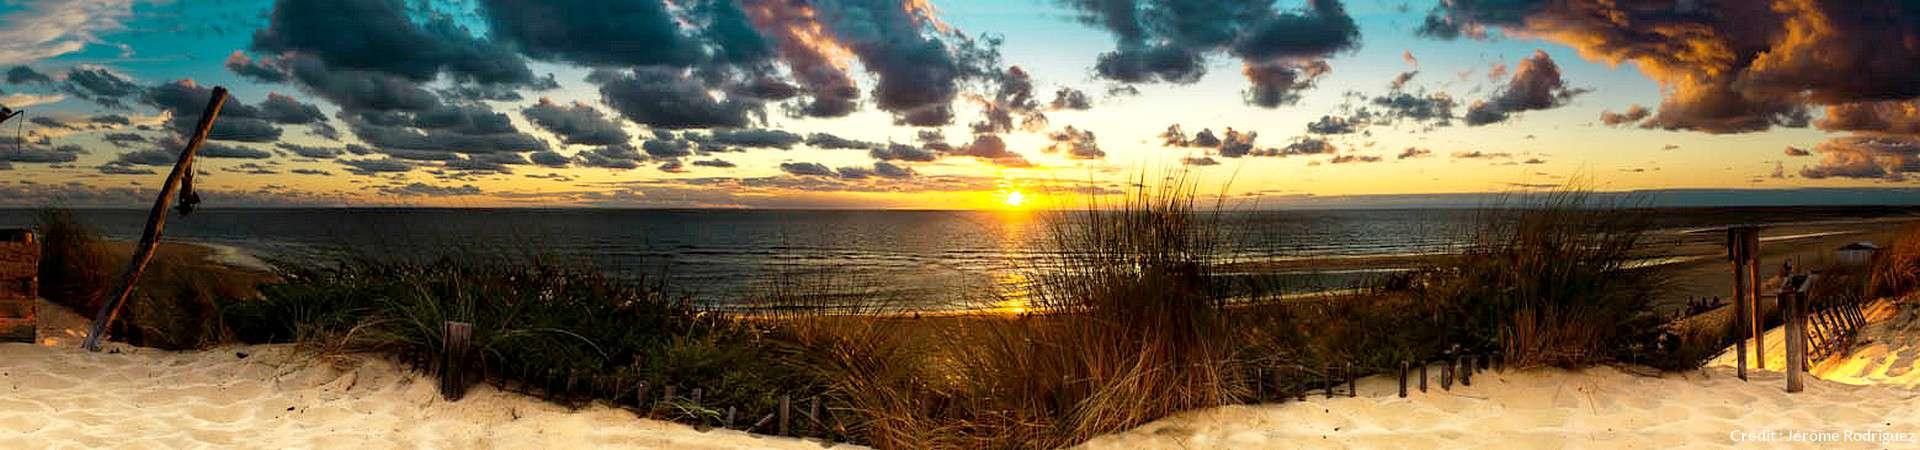 10 plus belles balades à Arcachon - Cap Ferret